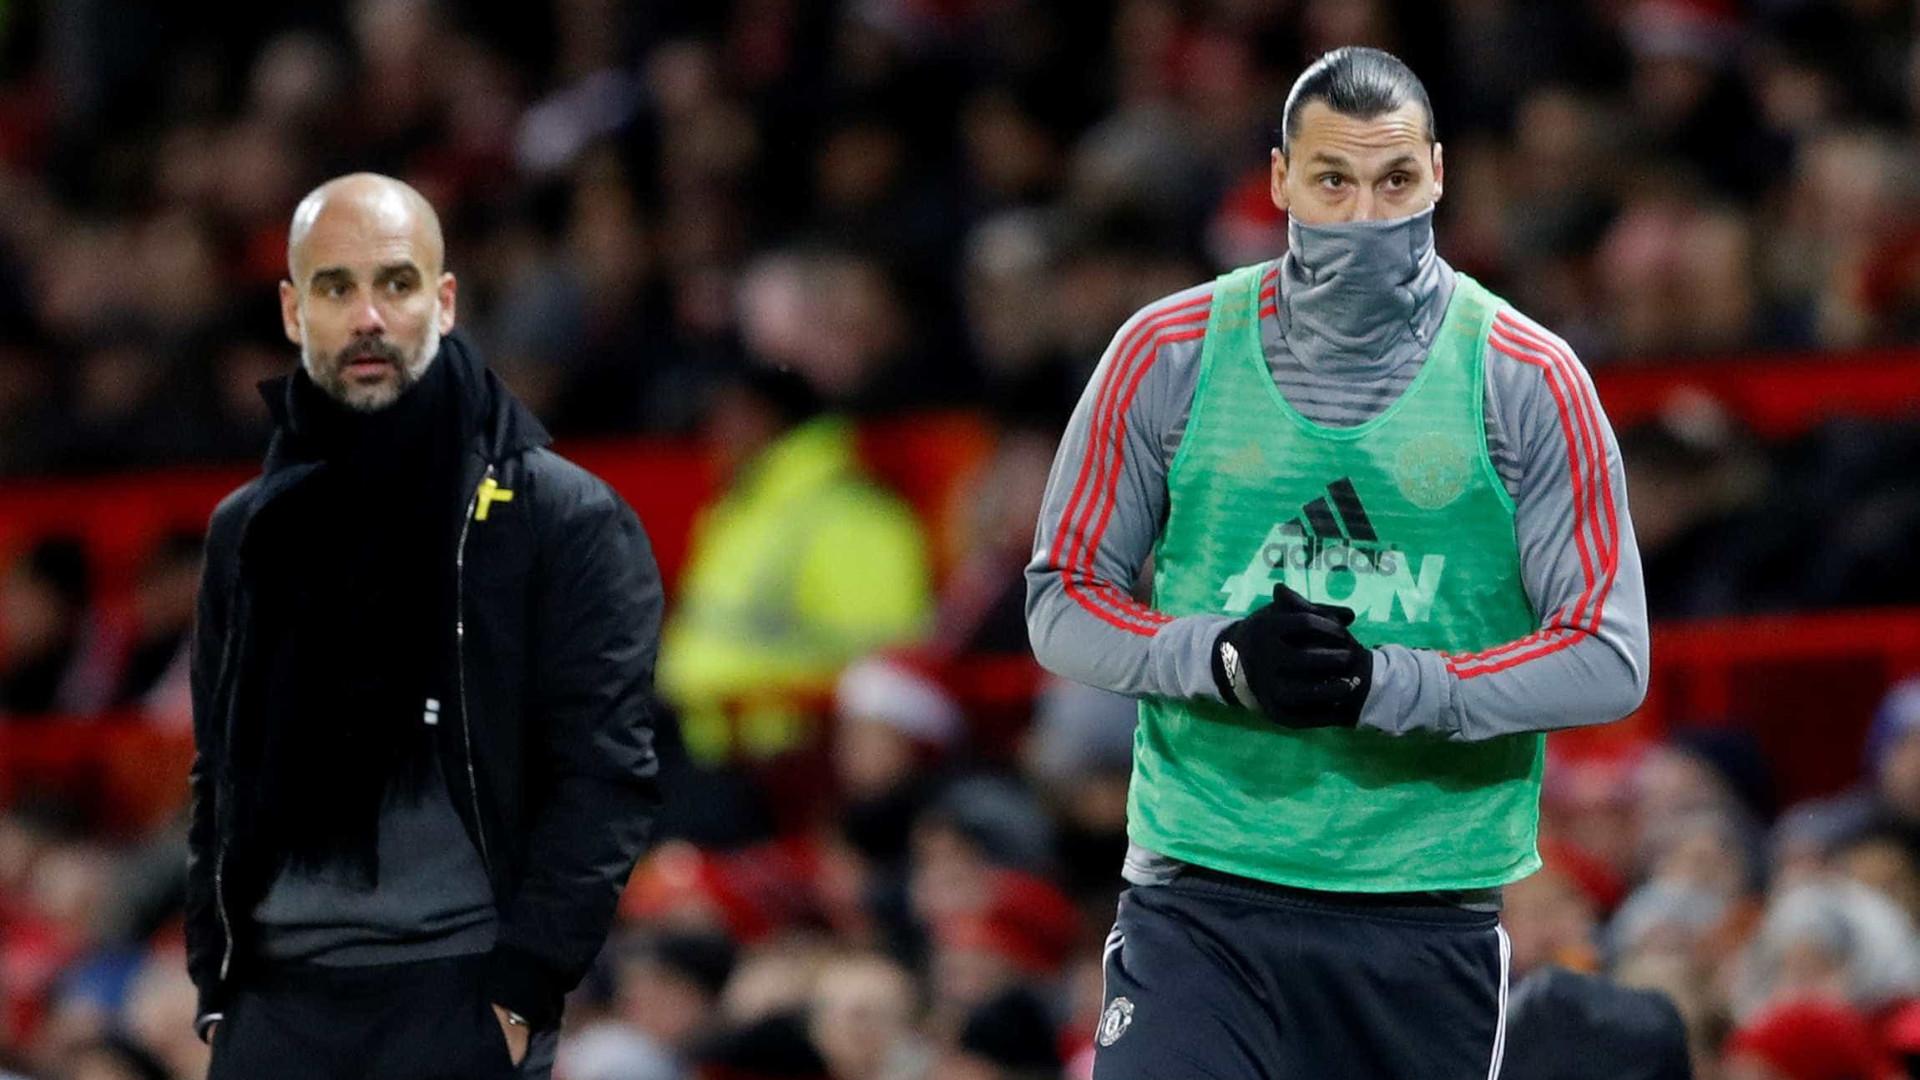 A 'boca' a Ibrahimovic que provocou o caos no túnel de Old Trafford